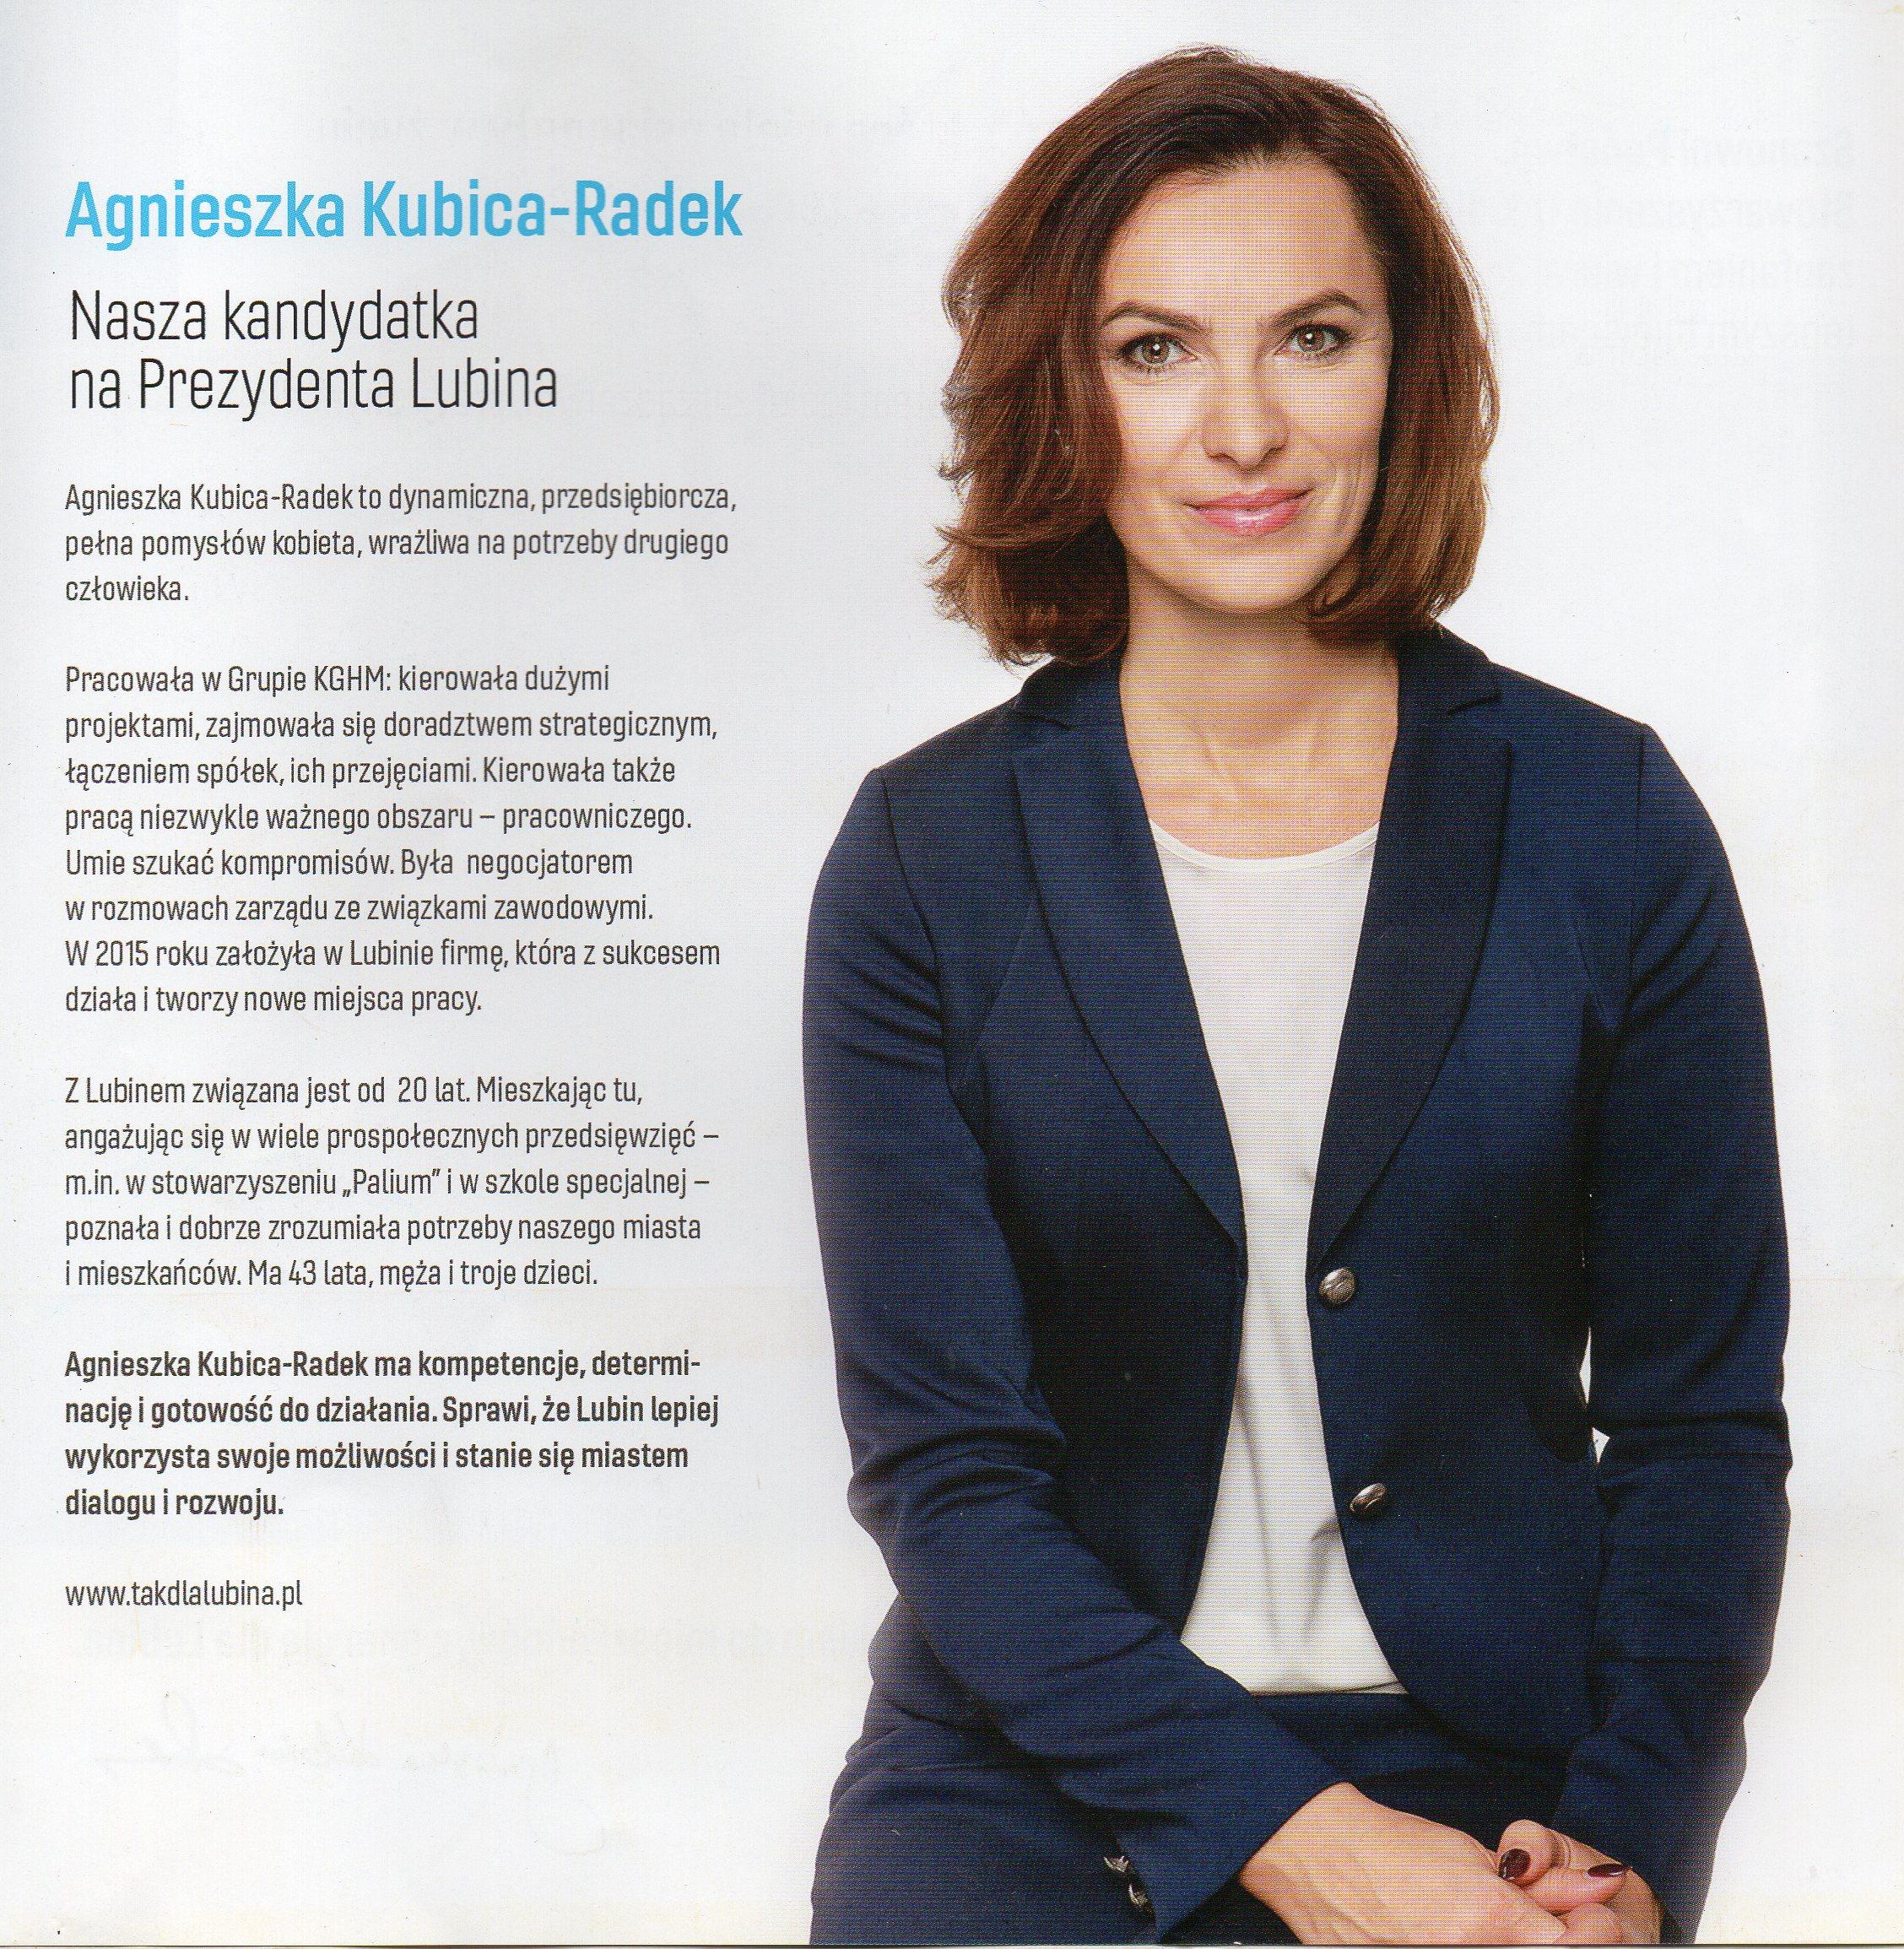 Agnieszka Kubica-Radek